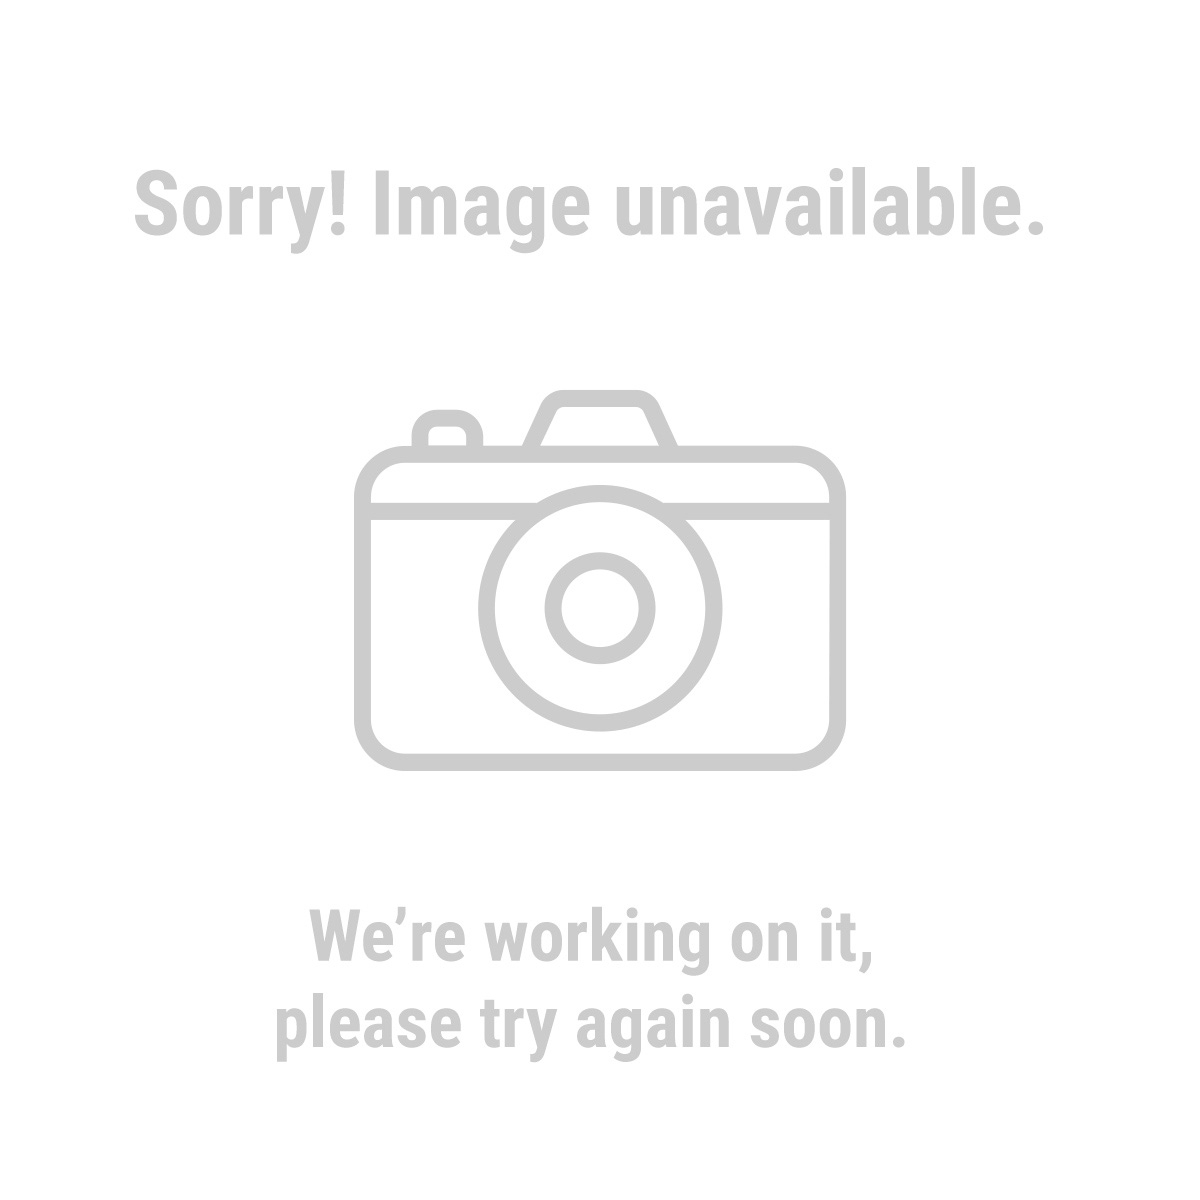 "Central Pneumatic 60416 6000 Piece 3/4"" x 23 Gauge Pin Nails"